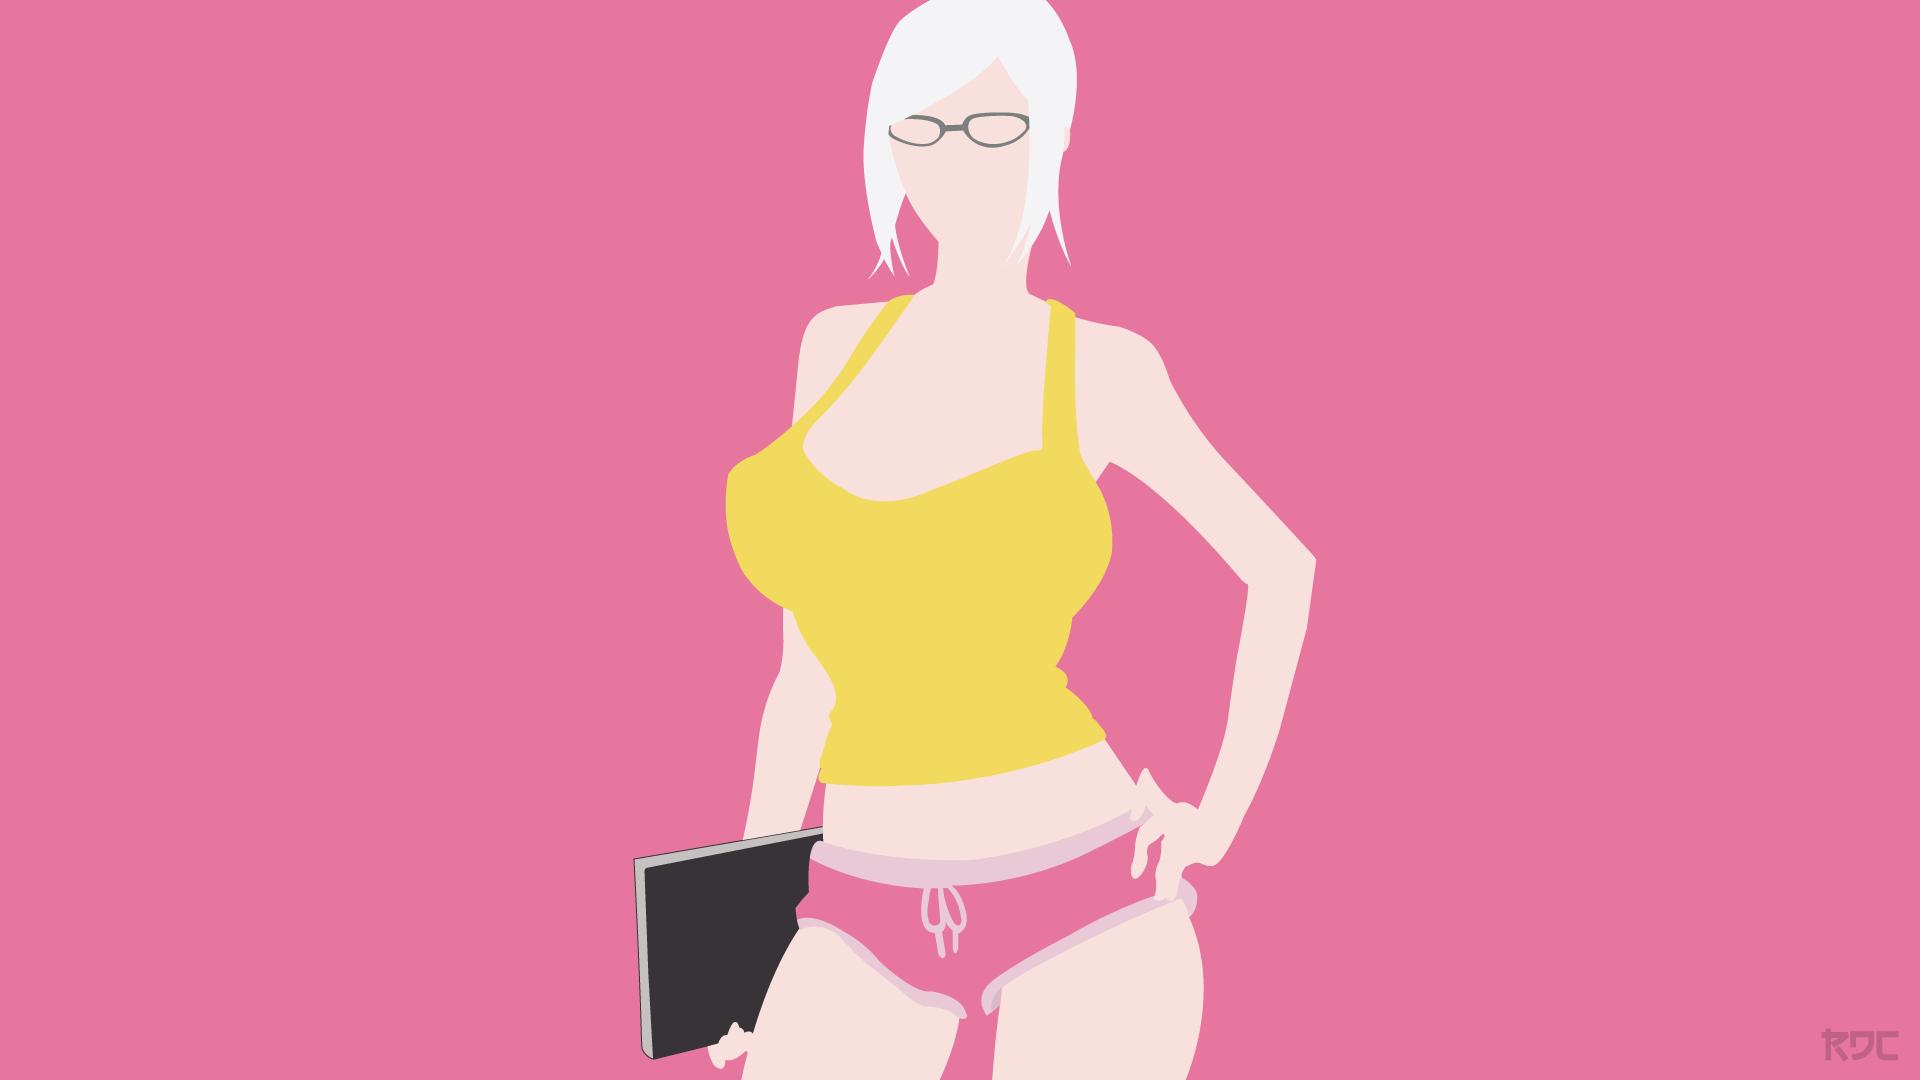 Anime 1920x1080 Prison School anime girls Shiraki Meiko blonde huge breasts big boobs women with glasses glasses short shorts tank top yellow tank top cleavage pink